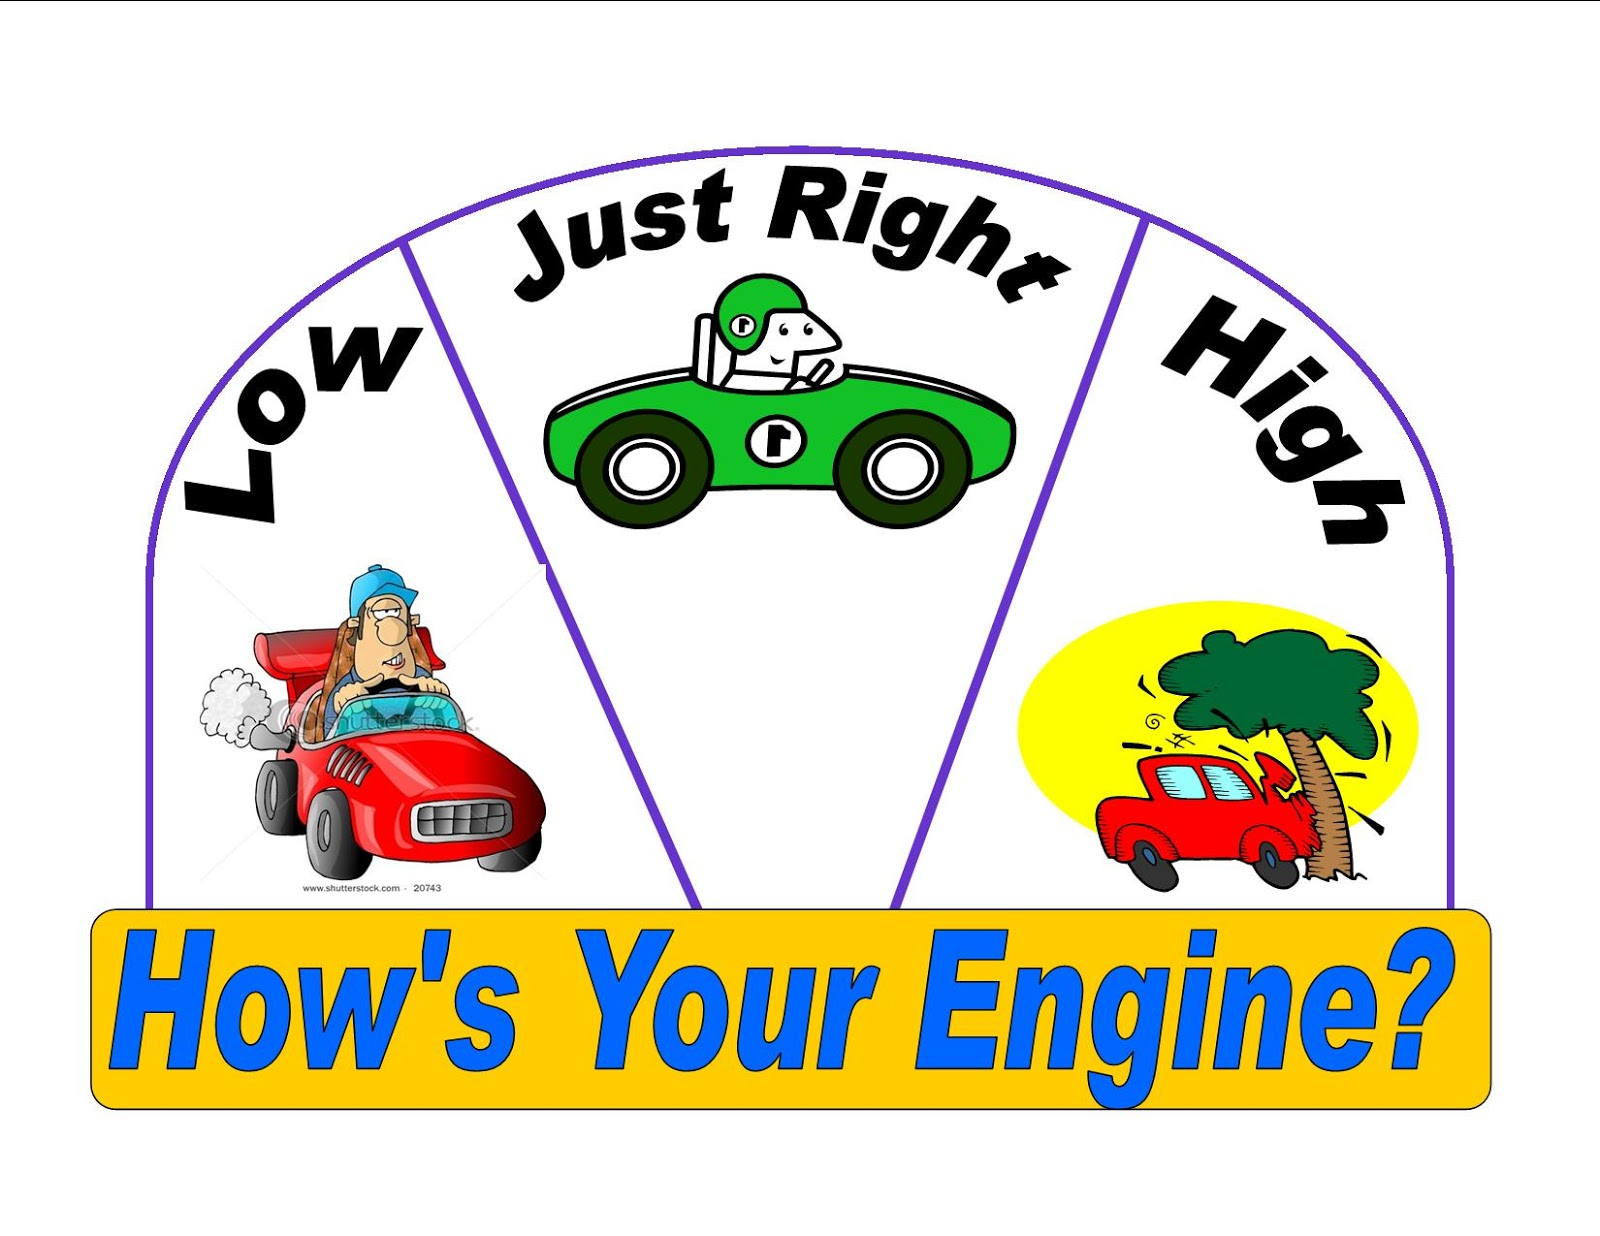 Room 207 S Kindyblog How S Your Engine